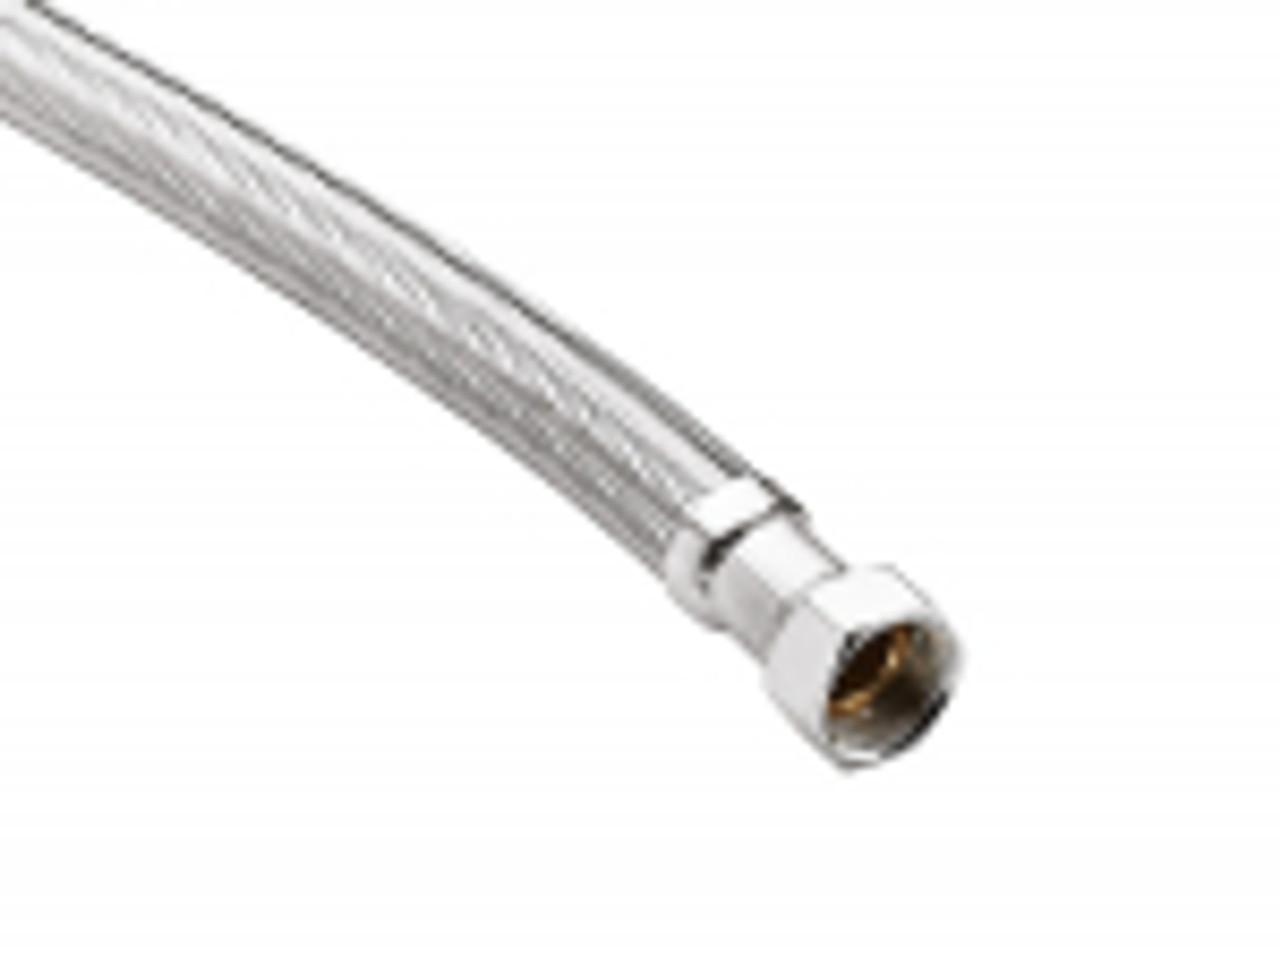 8 mm id 1 m JULABO CR Rubber Tubing